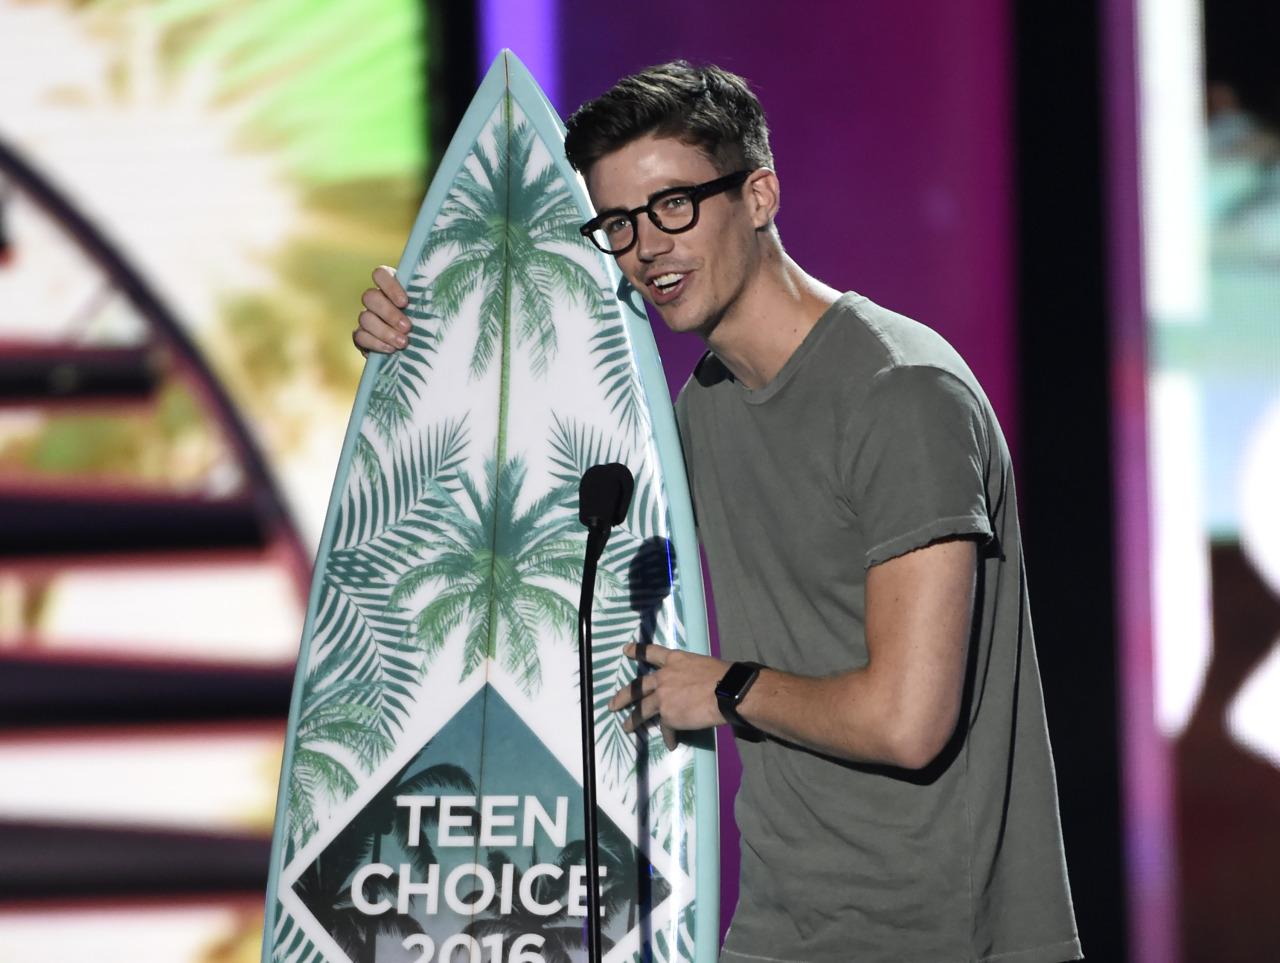 Teen Choice - Grant Gustin 1.jpg